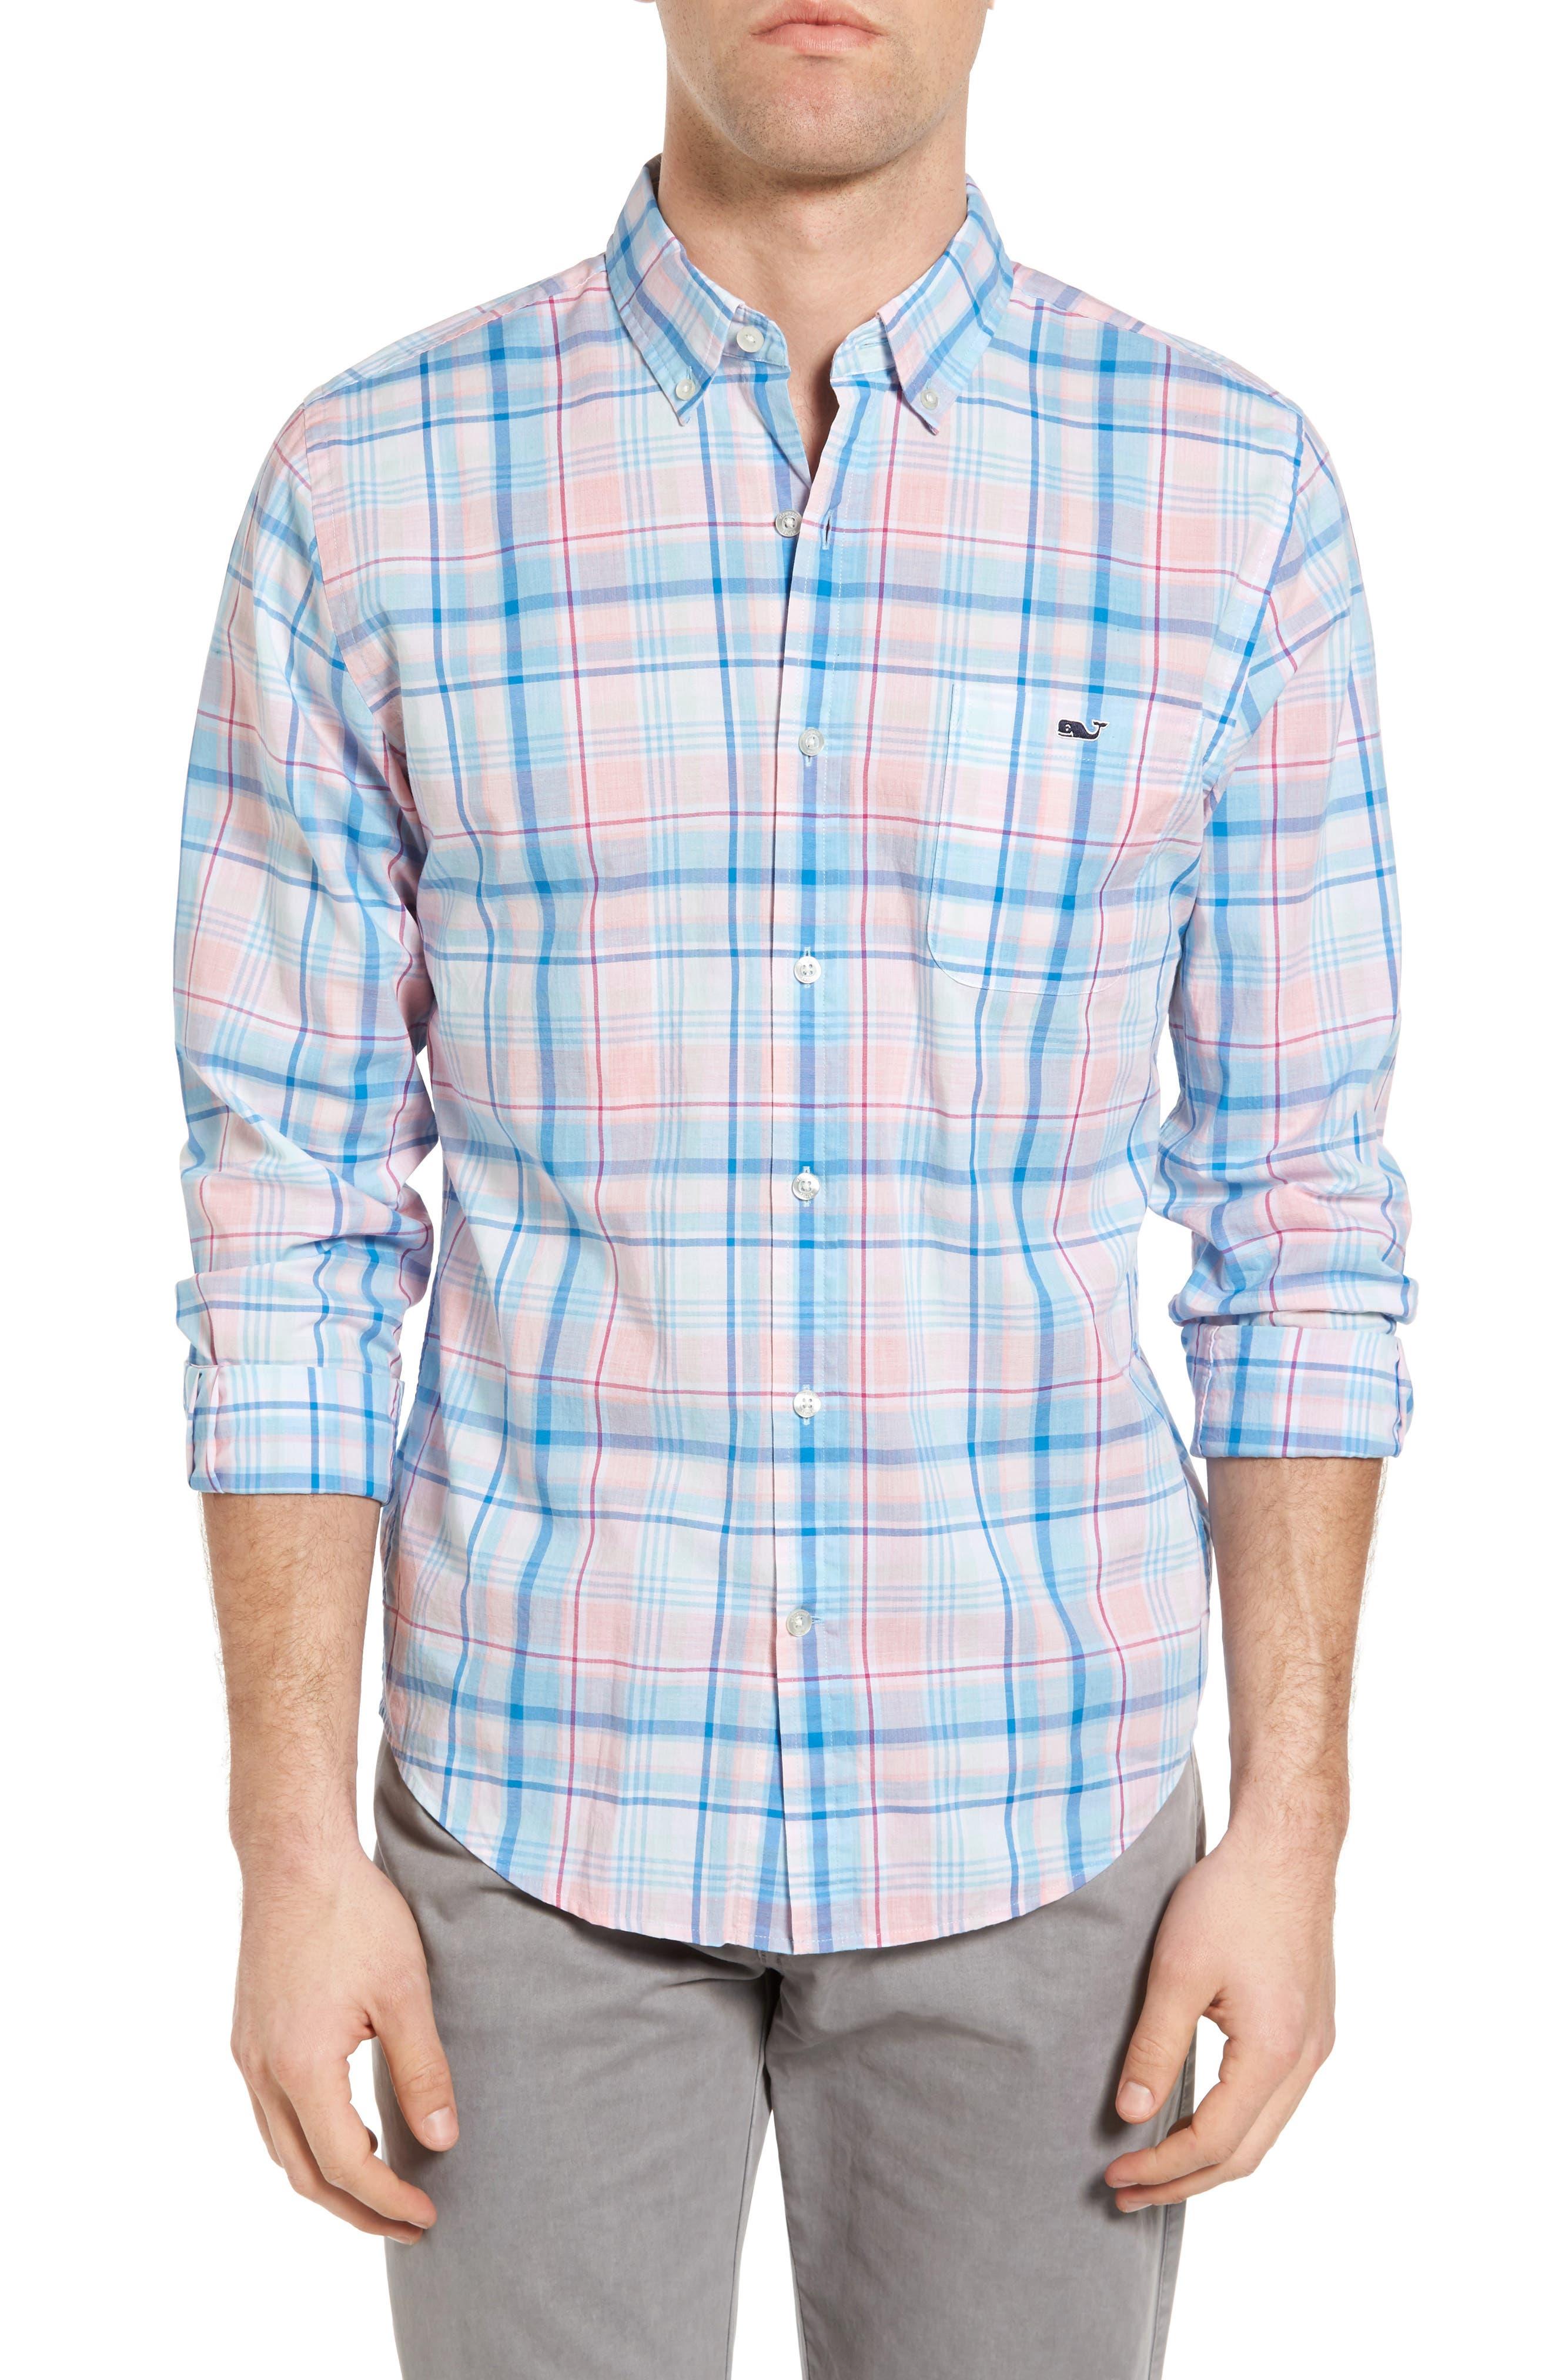 Alternate Image 1 Selected - Vineyard Vines Sabab Rock Tucker Slim Fit Plaid Sport Shirt